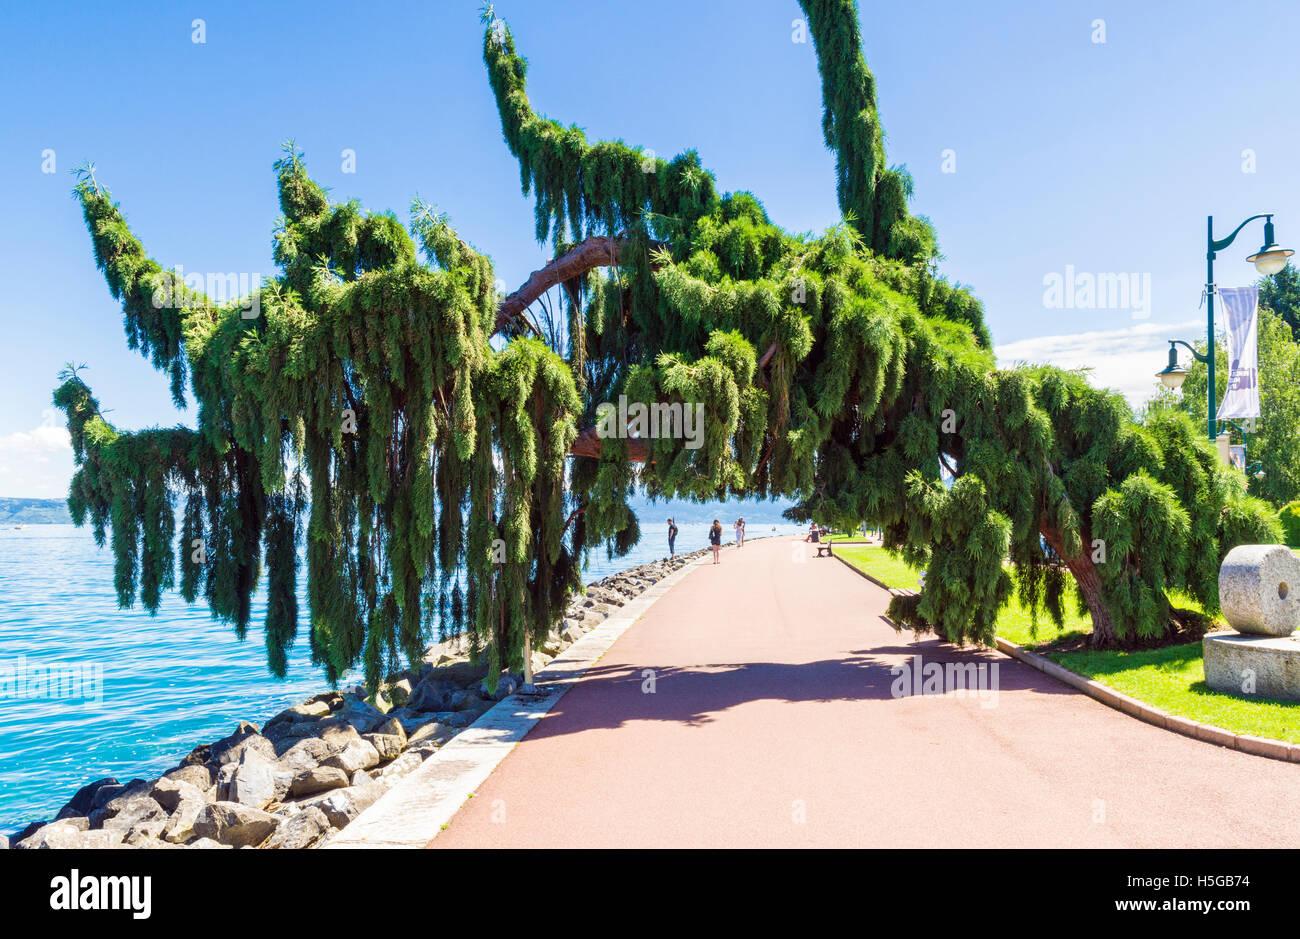 Un llanto árboles Sequoia recostada sobre la costanera de Evian-les-Bains, Francia Imagen De Stock